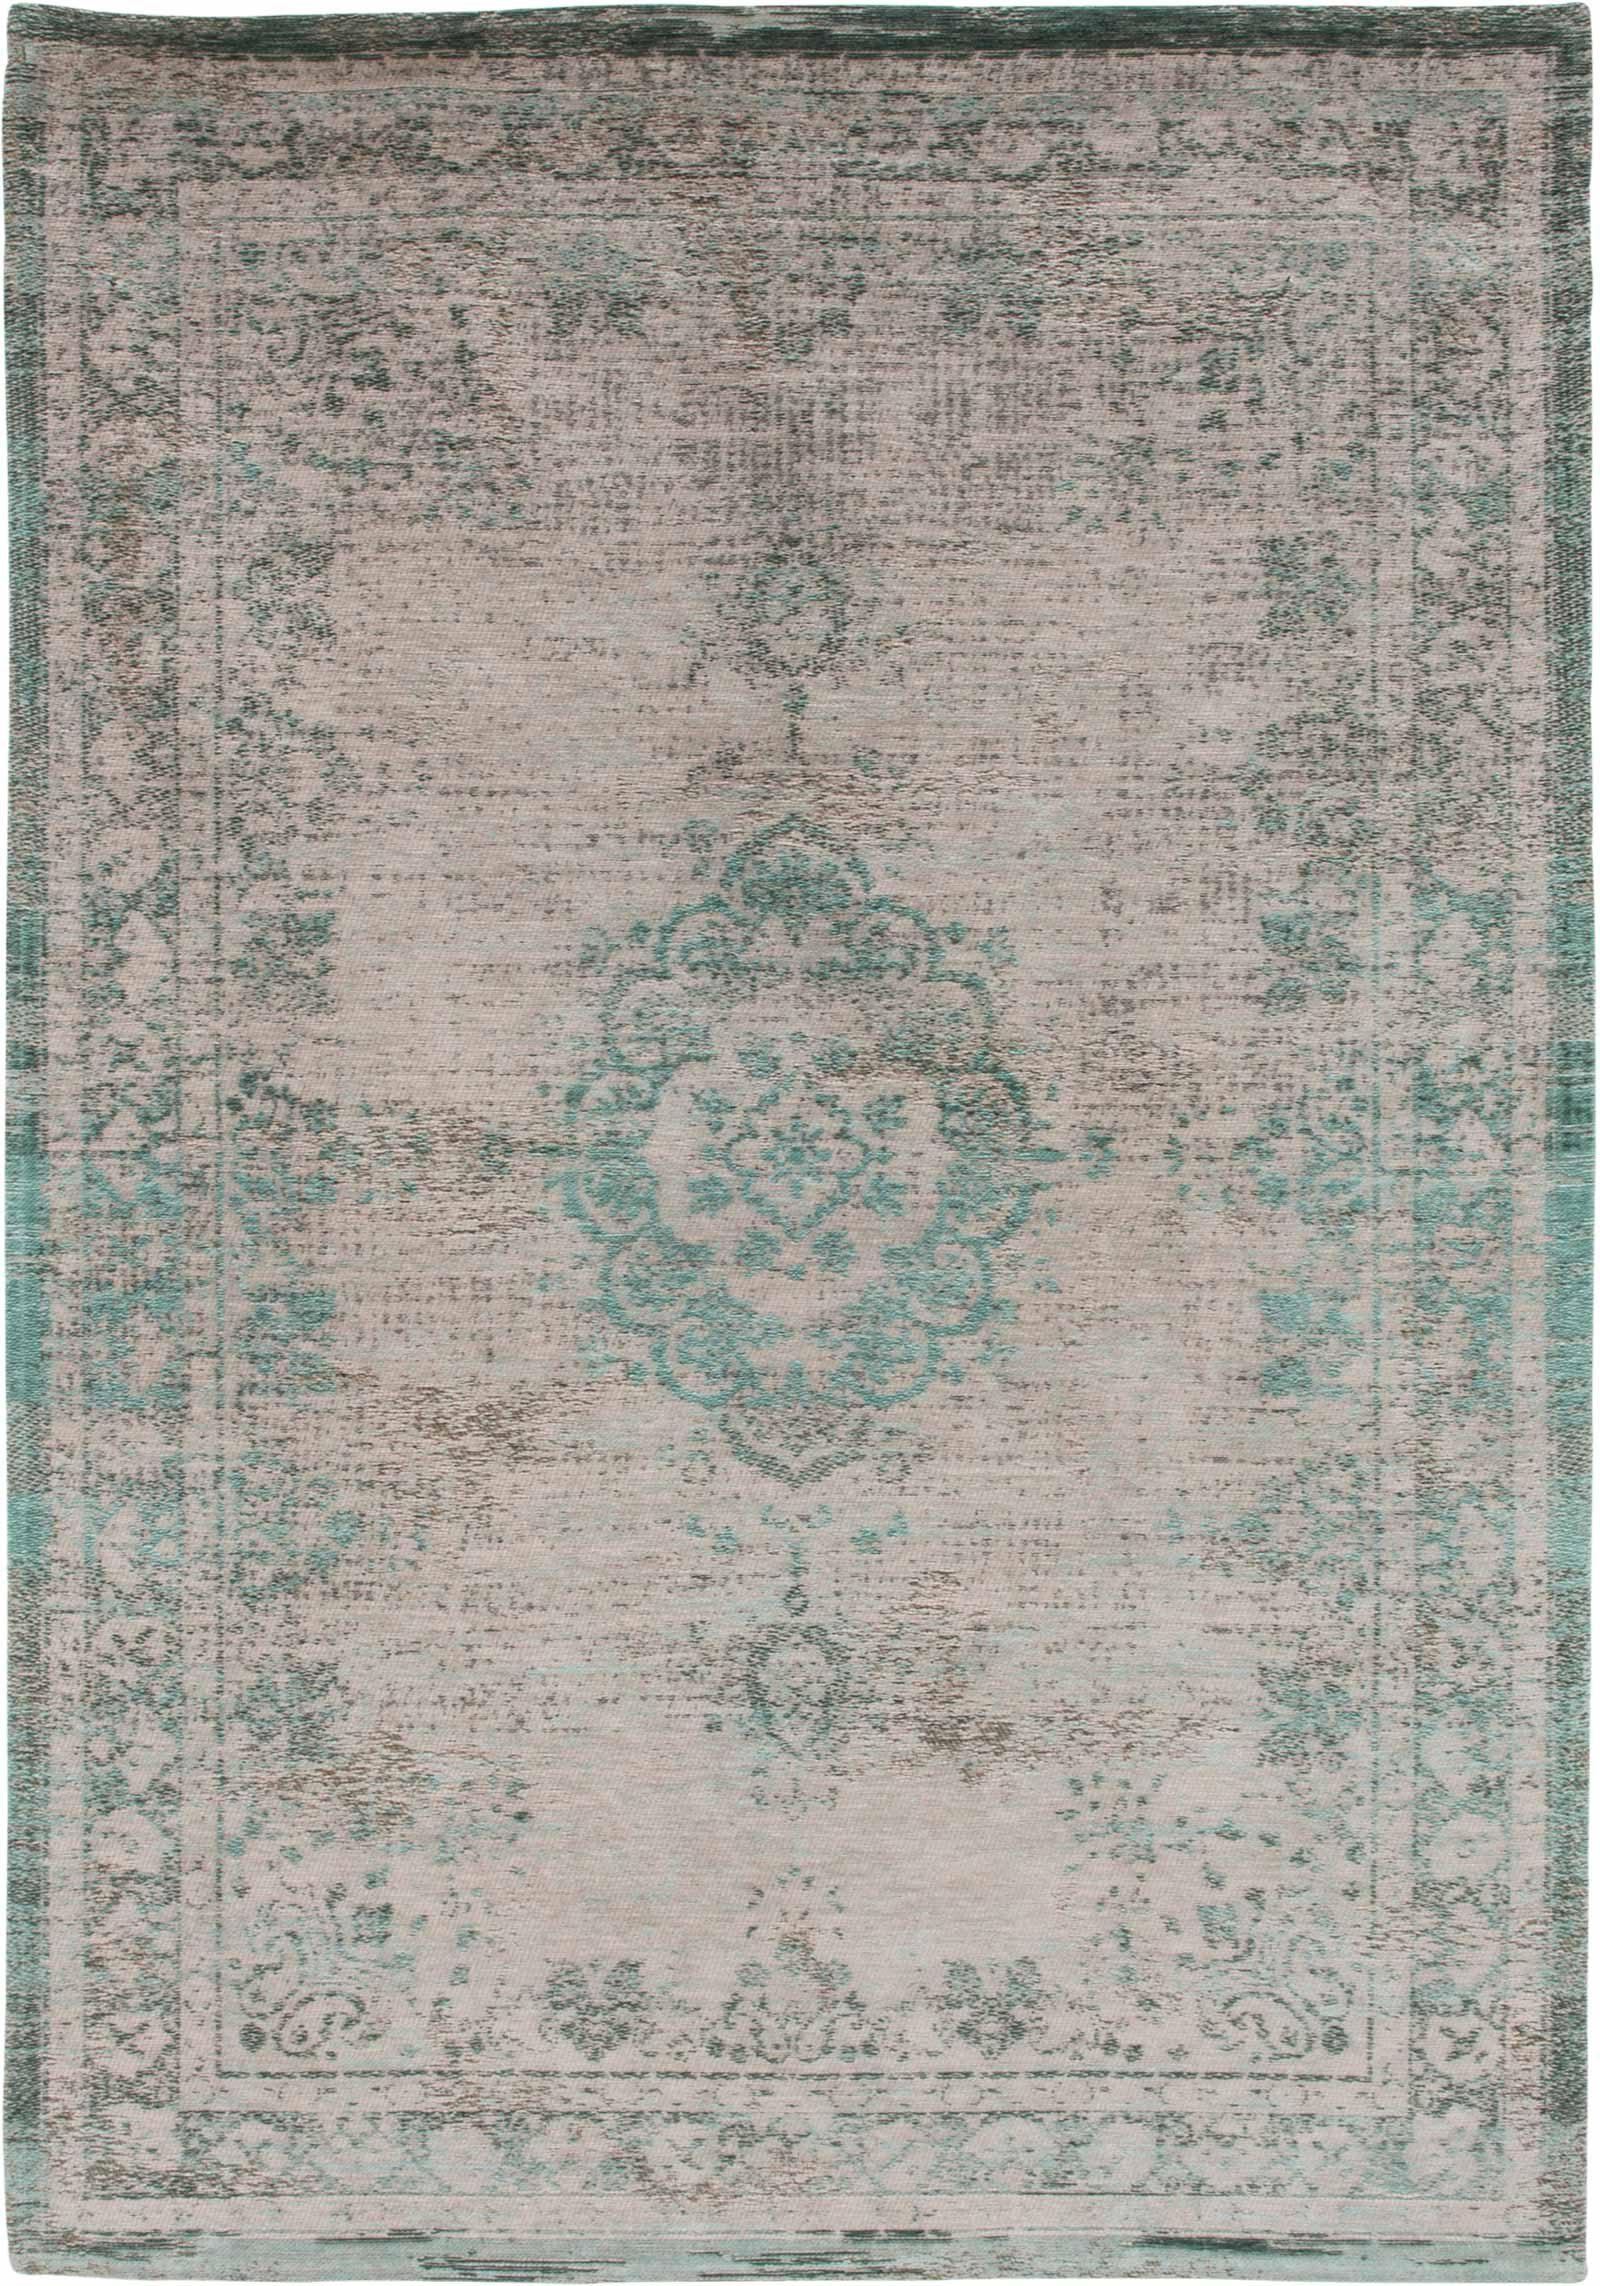 alfombras Louis De Poortere LX8259 Fading World Medaillon Jade Oyster